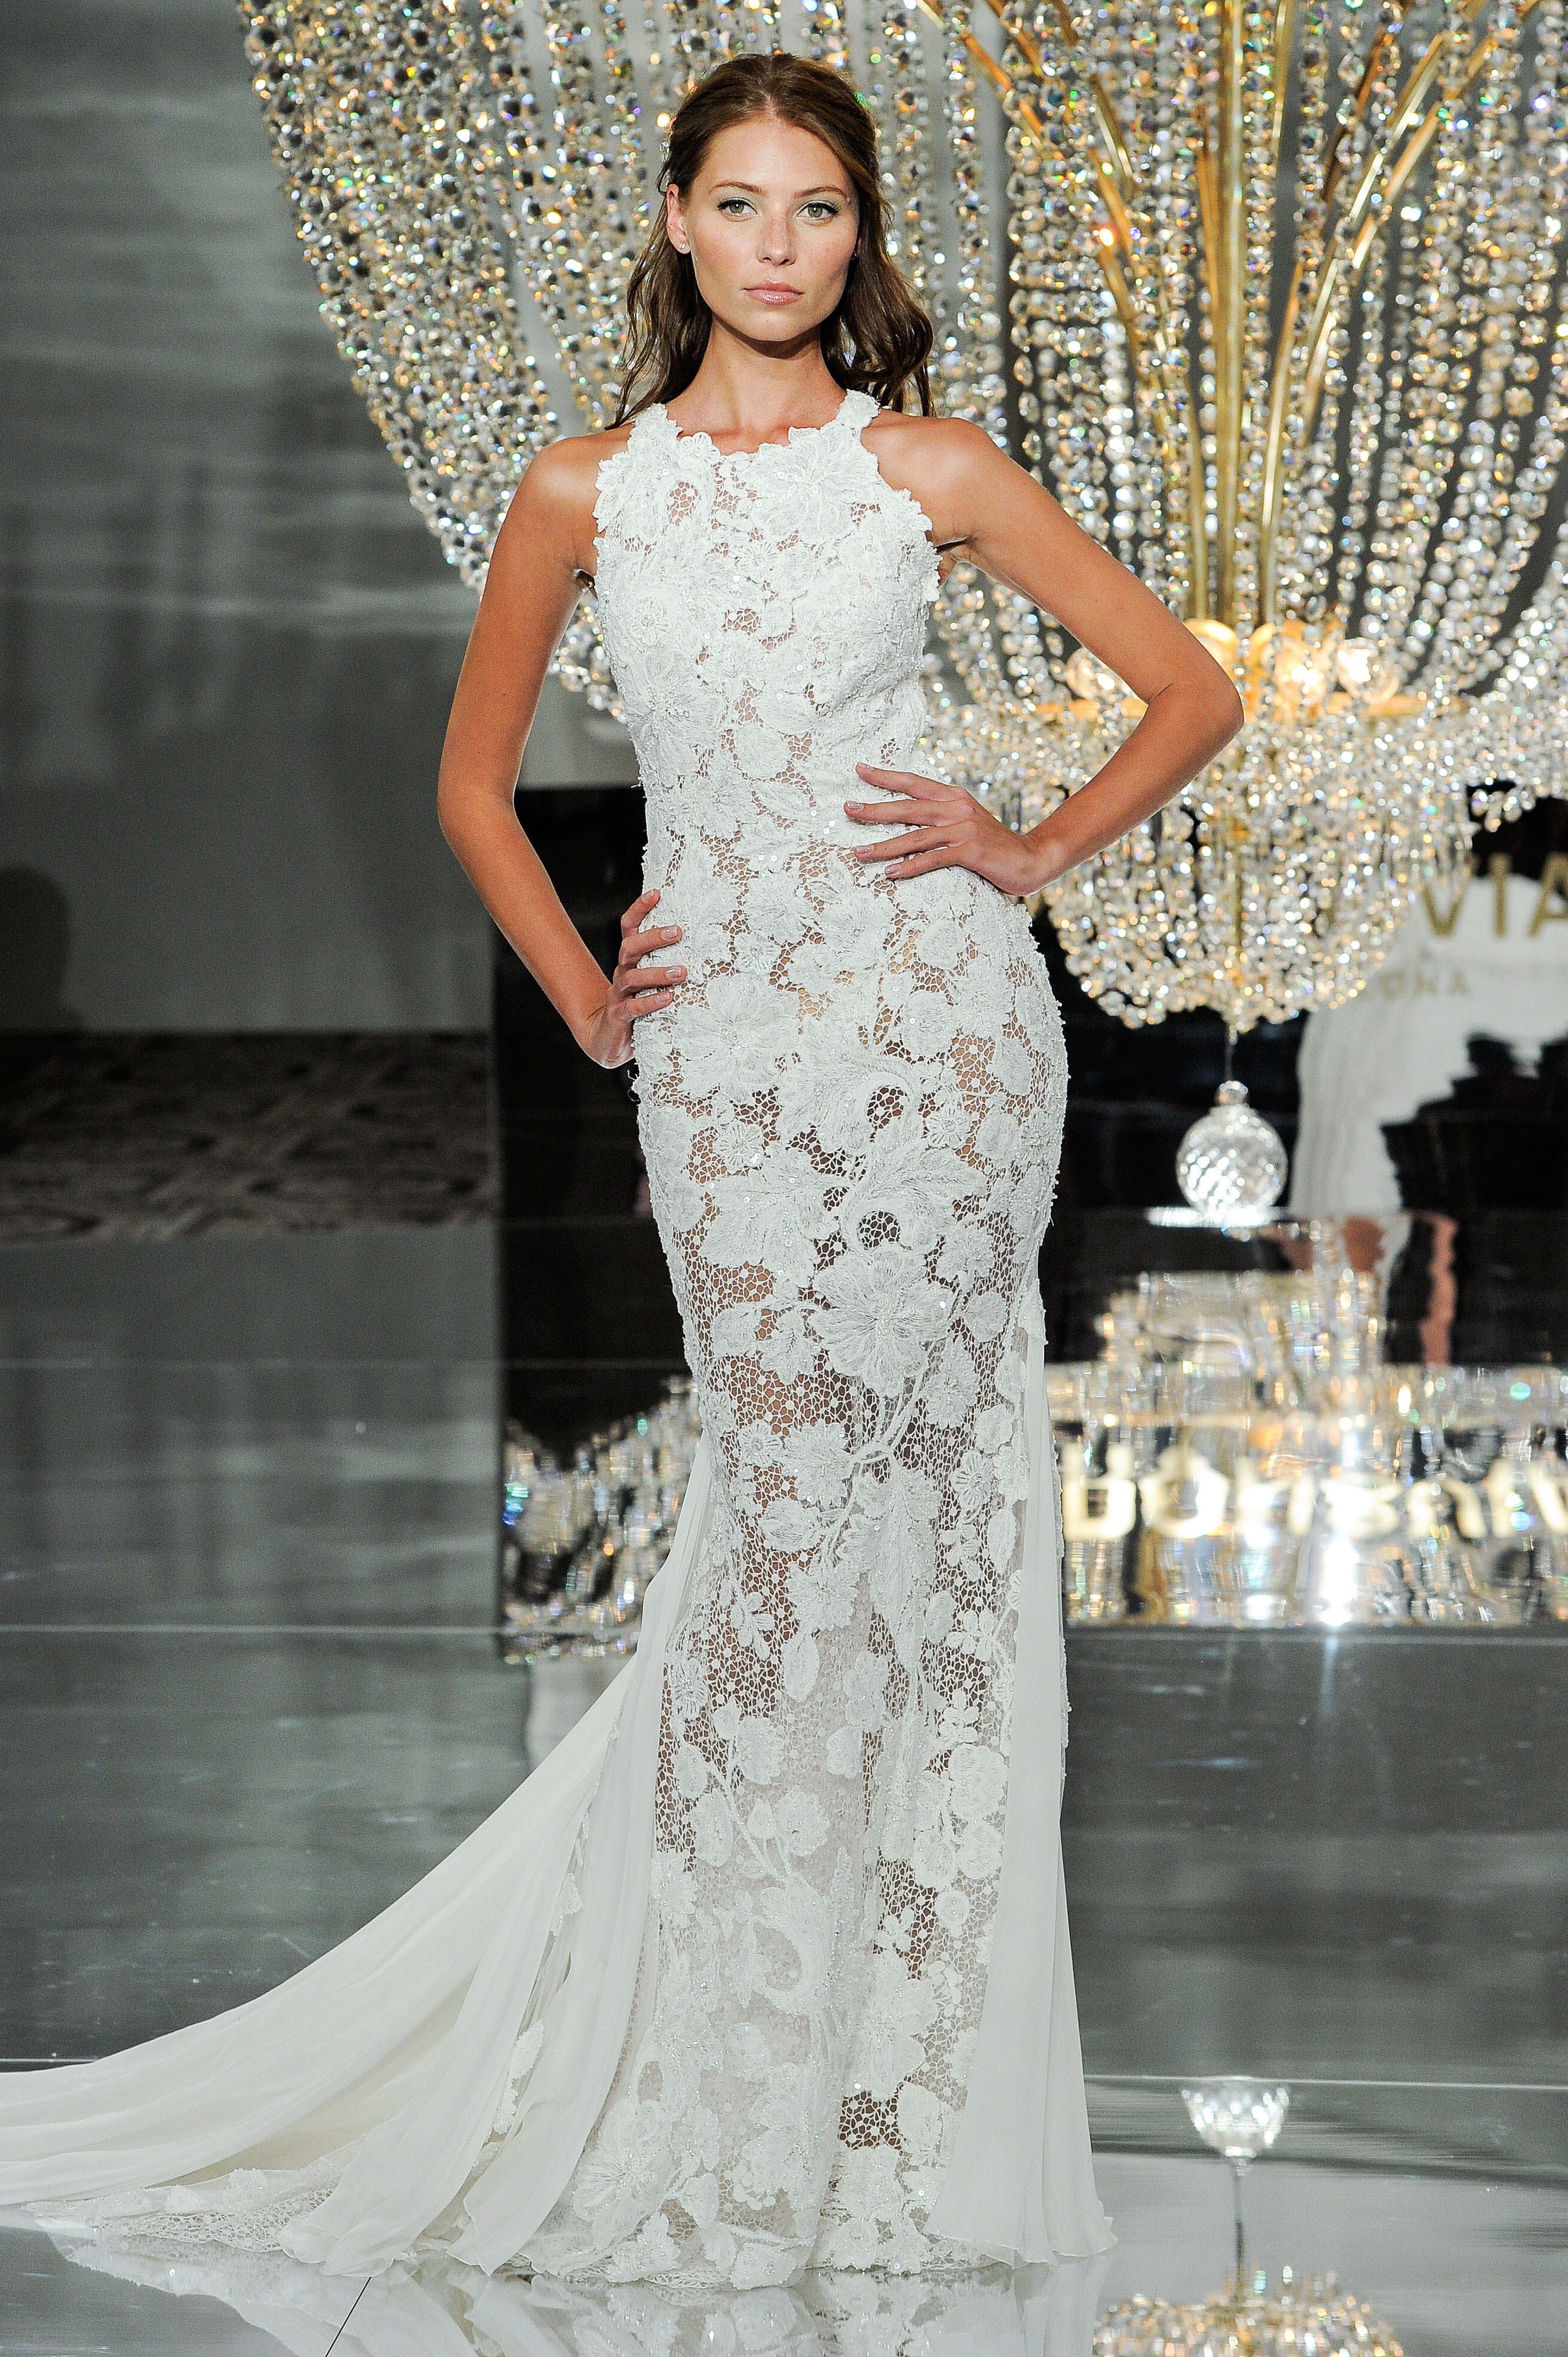 pronovias wedding dress fall 2018 sleeveless high neck trumpet embellished